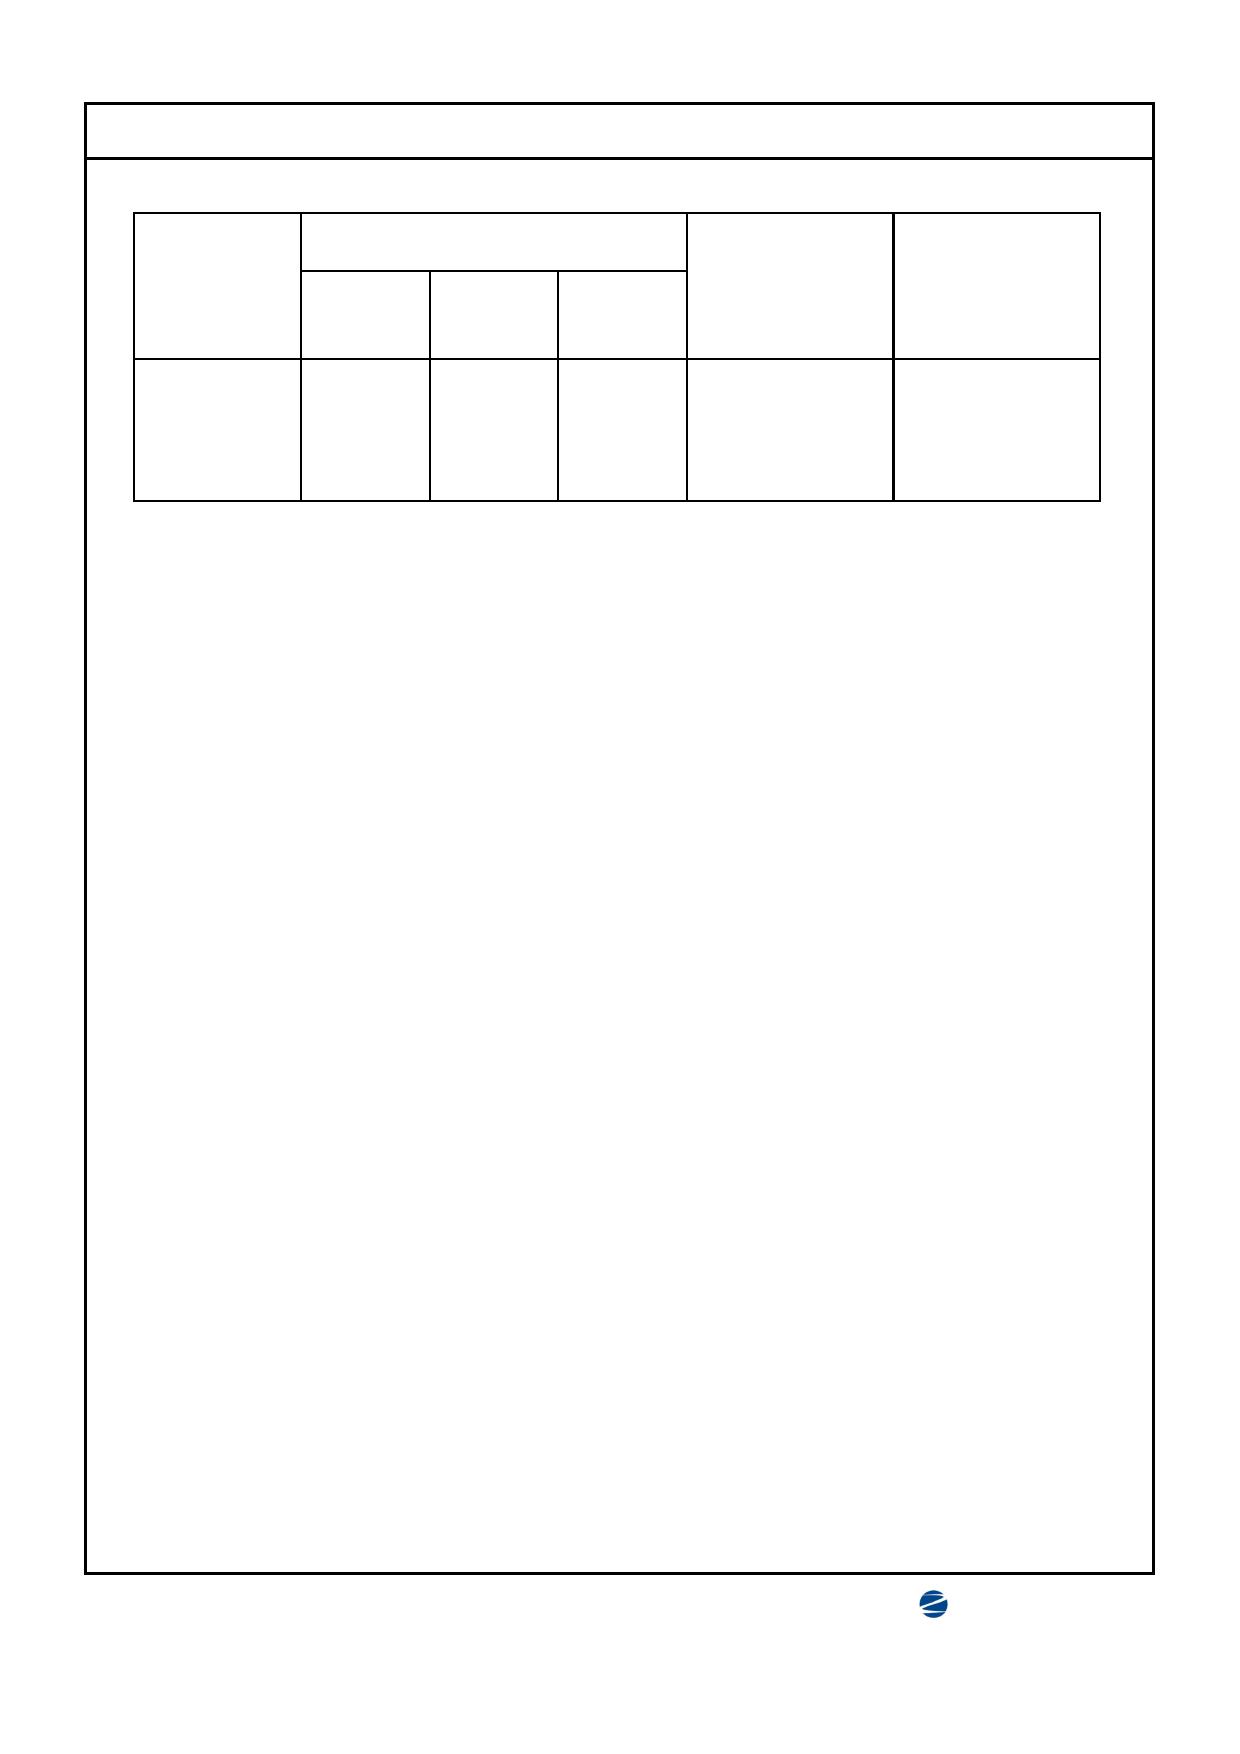 MBR30100CTSH pdf, ピン配列